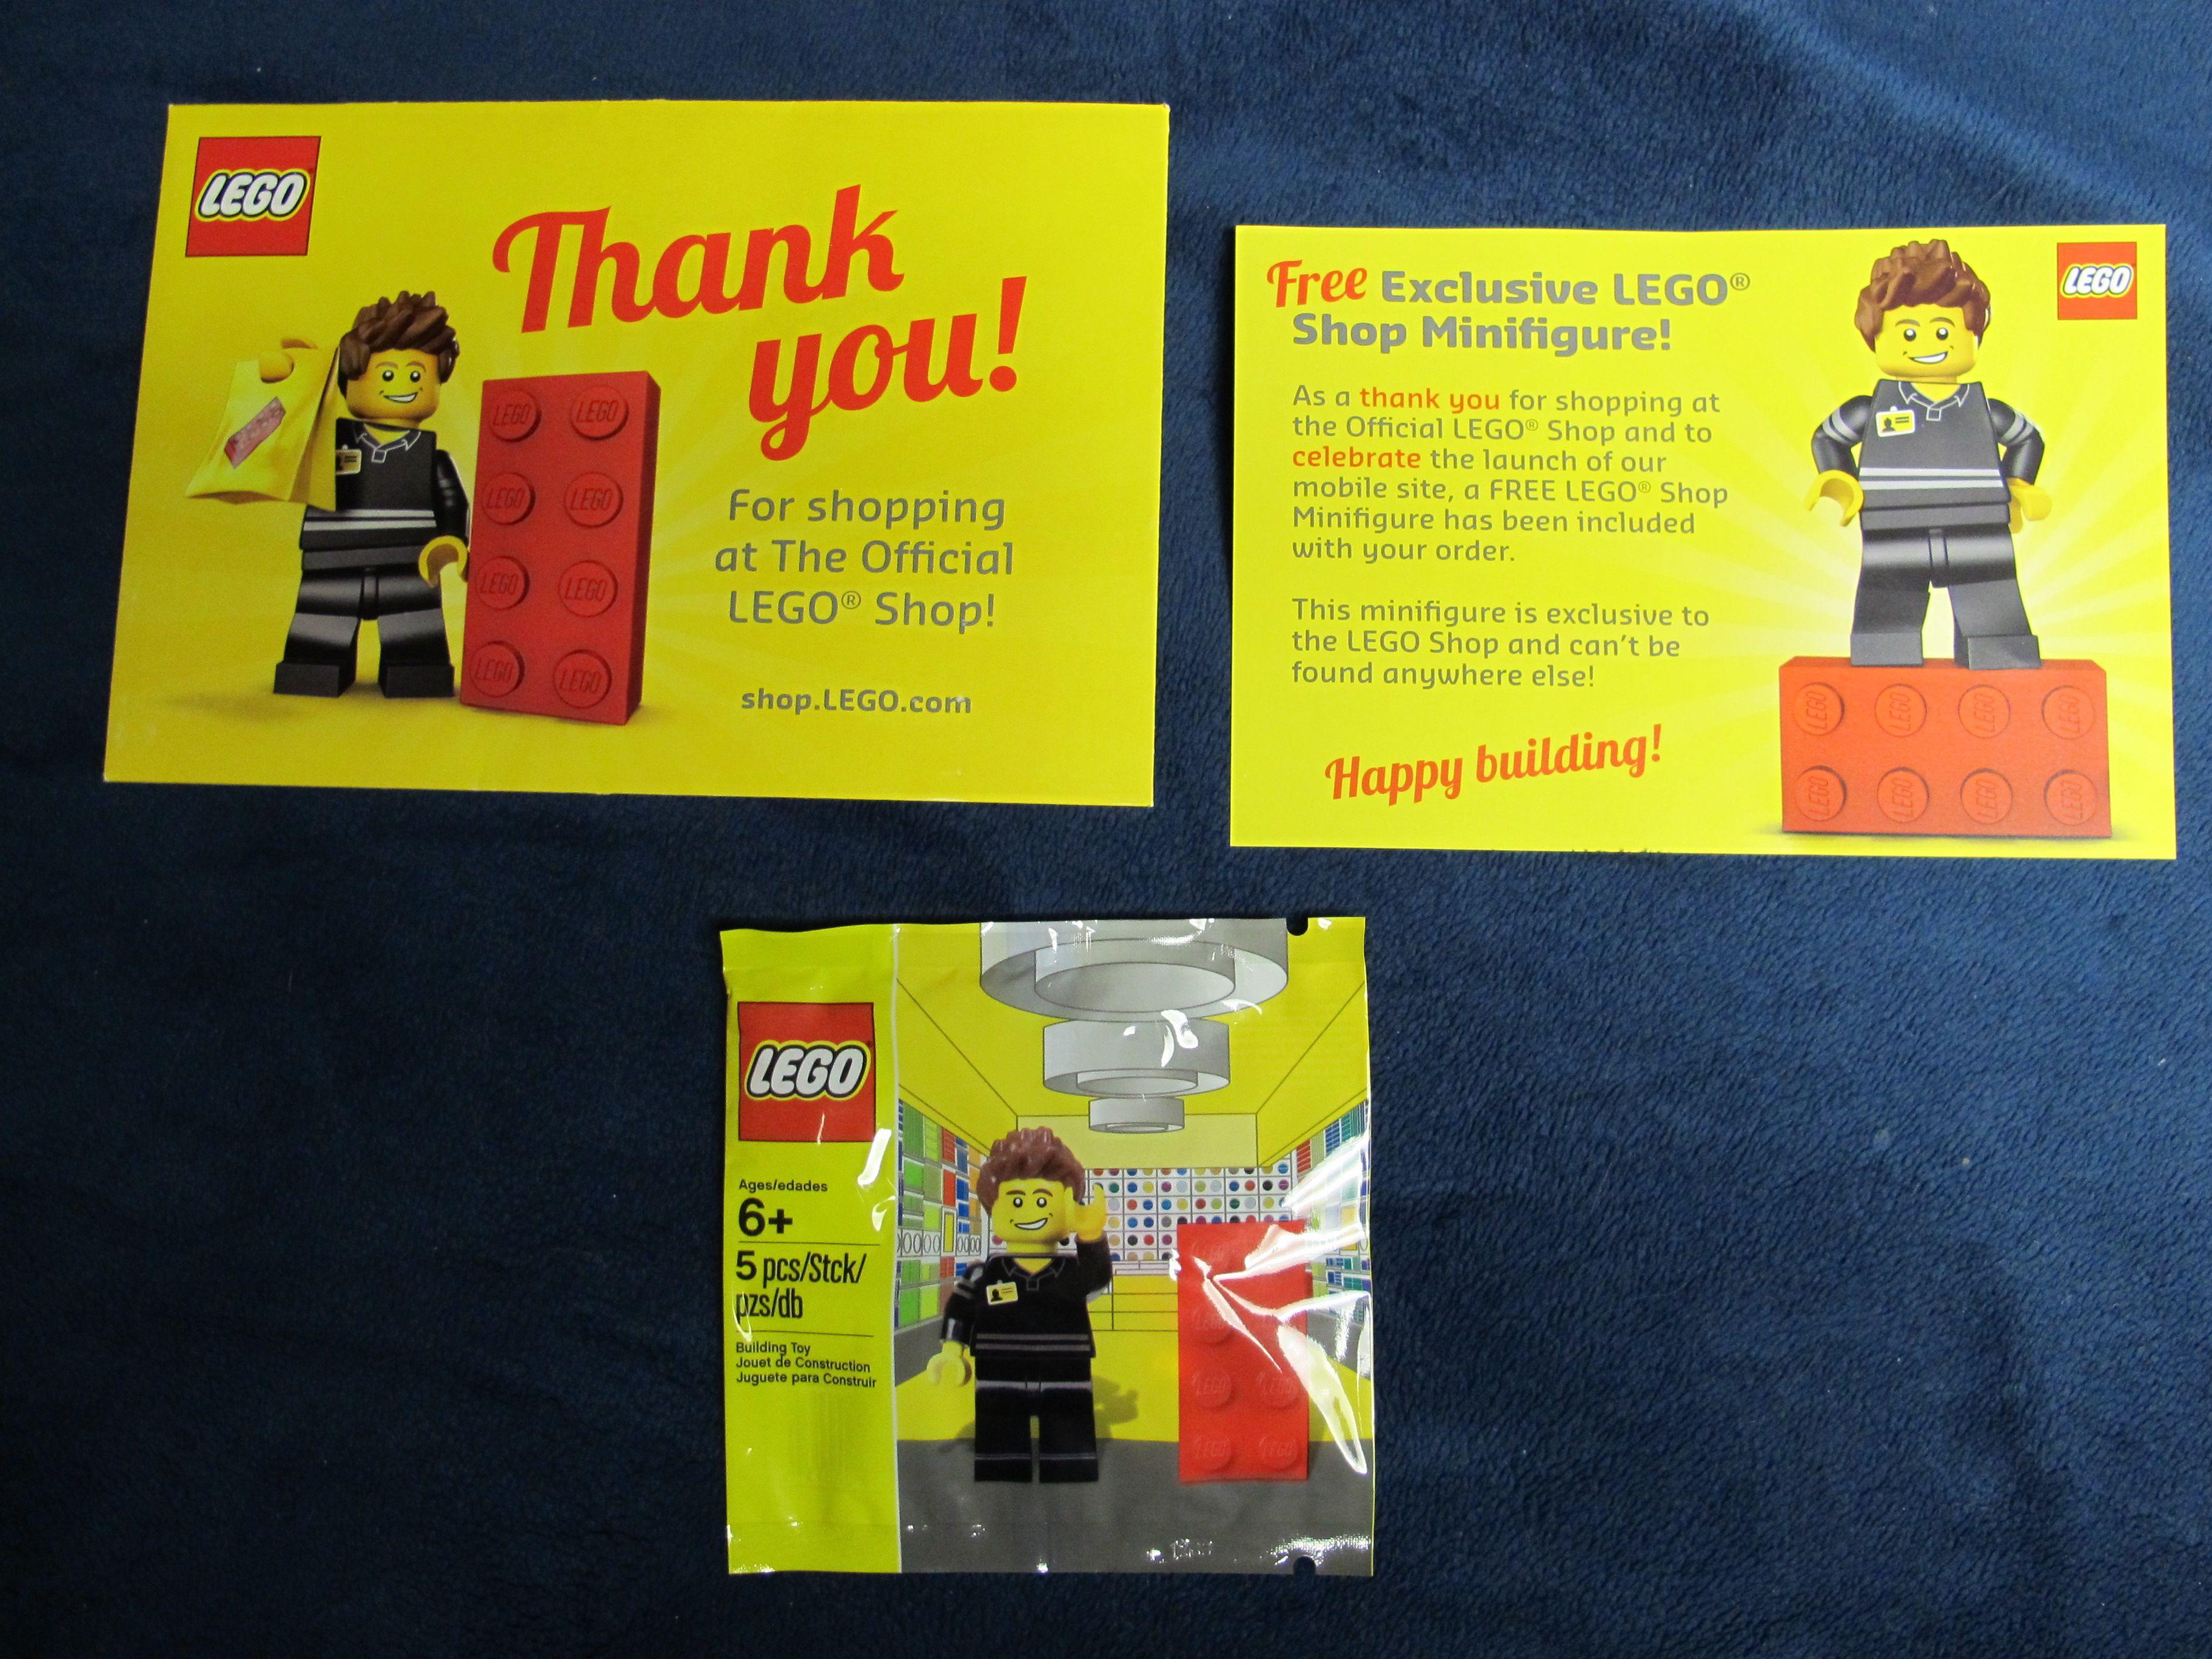 5001622 LEGO Store Employee Minifigure Updates – Toys N Bricks